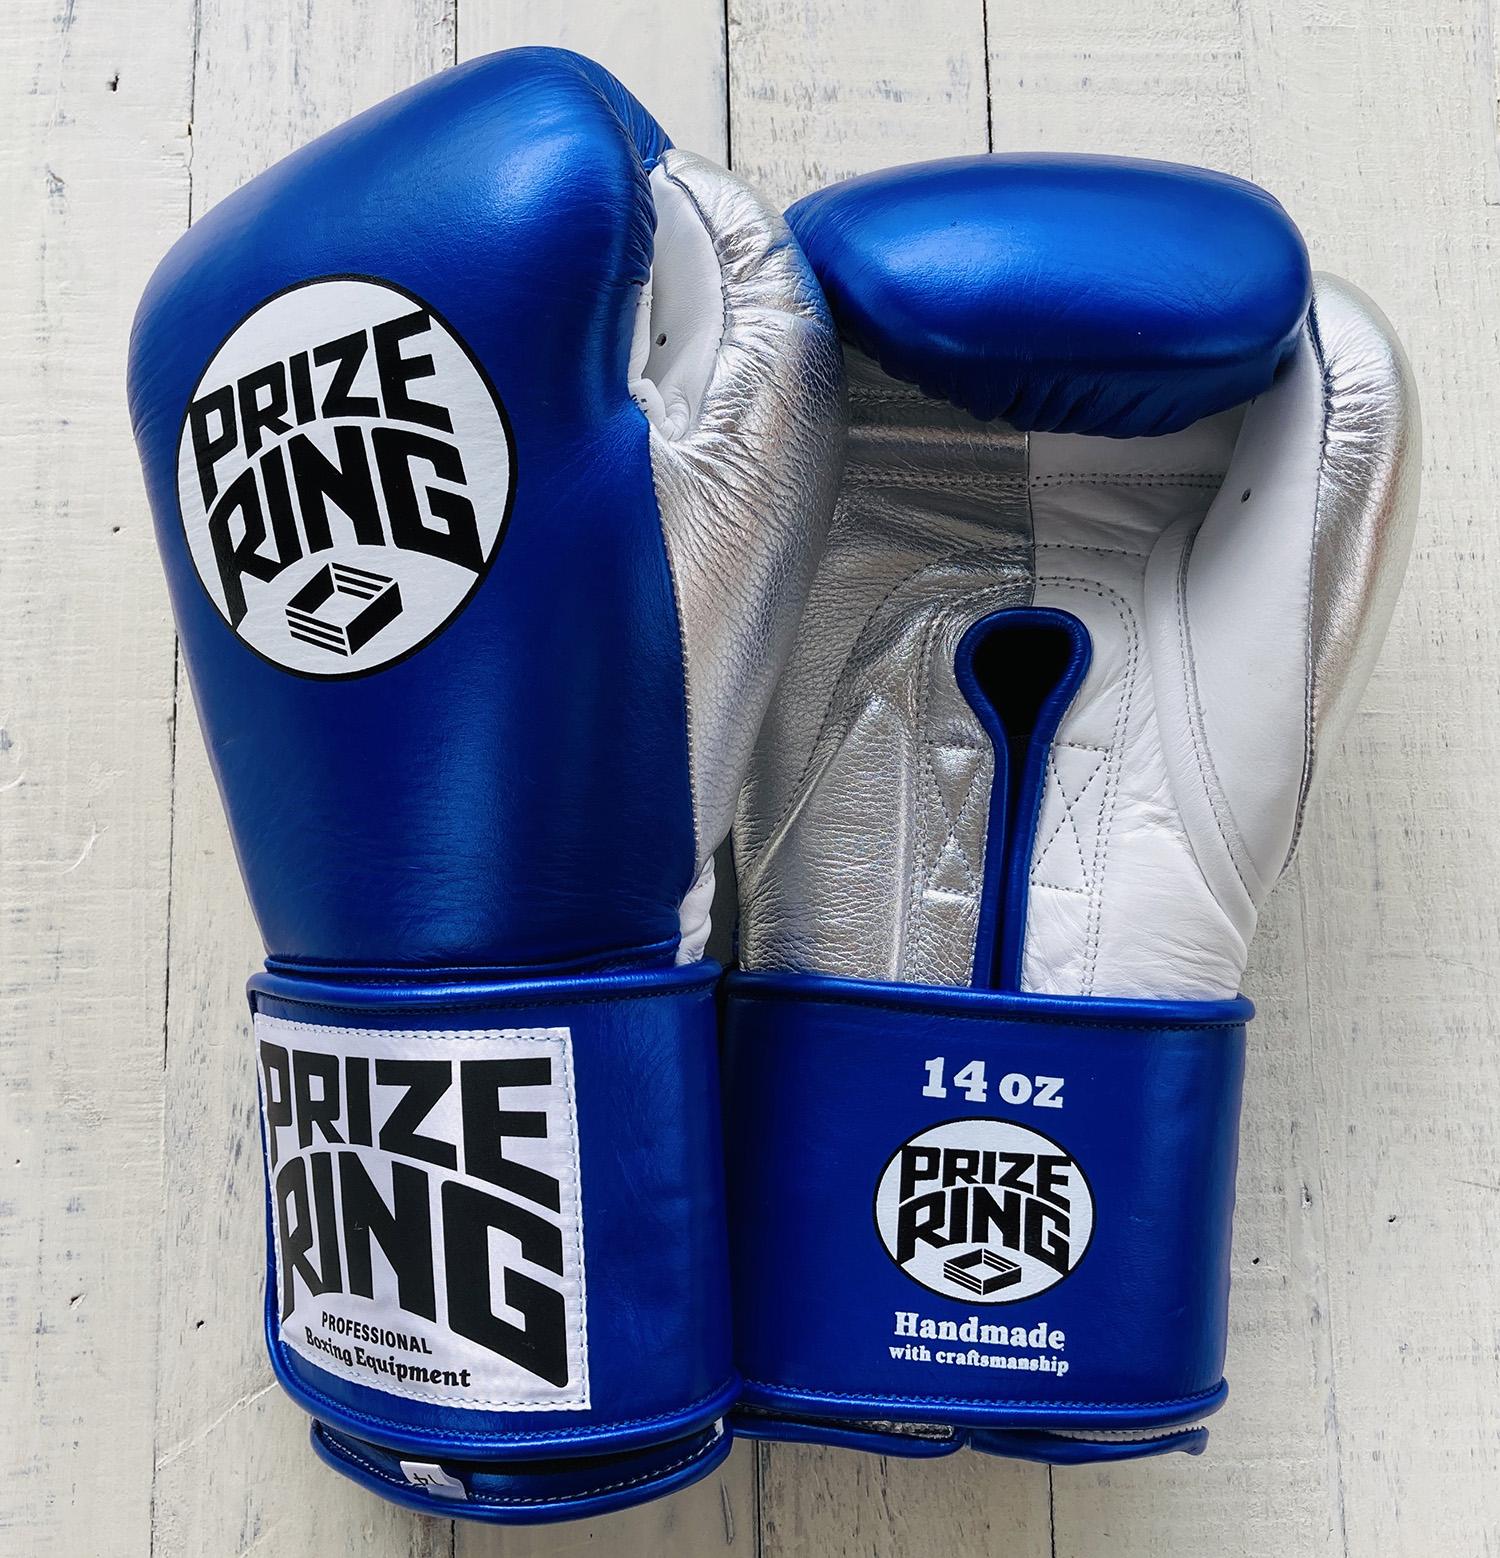 Pro-training gloves